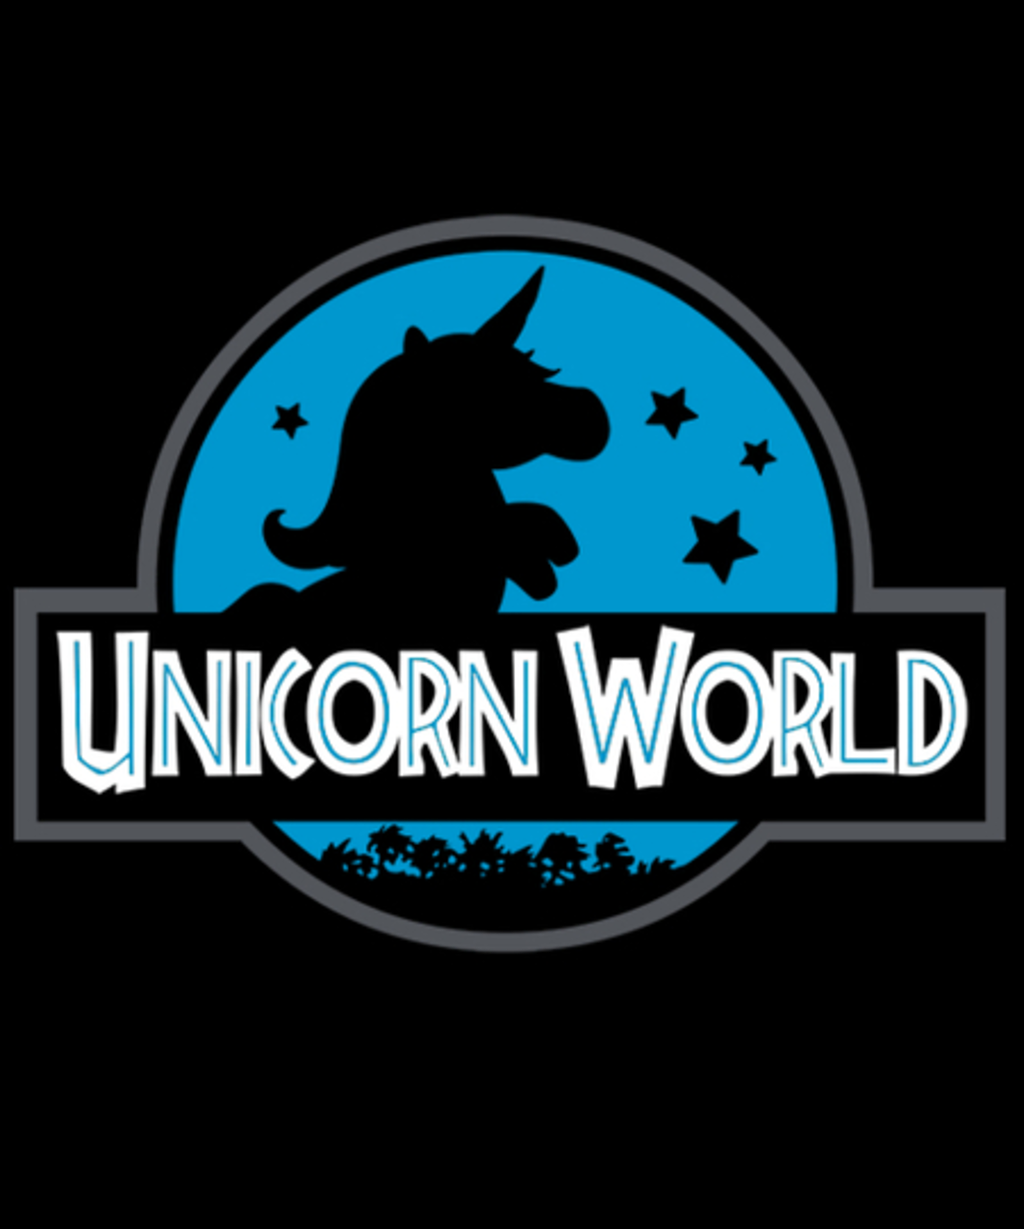 Qwertee: Unicorn World